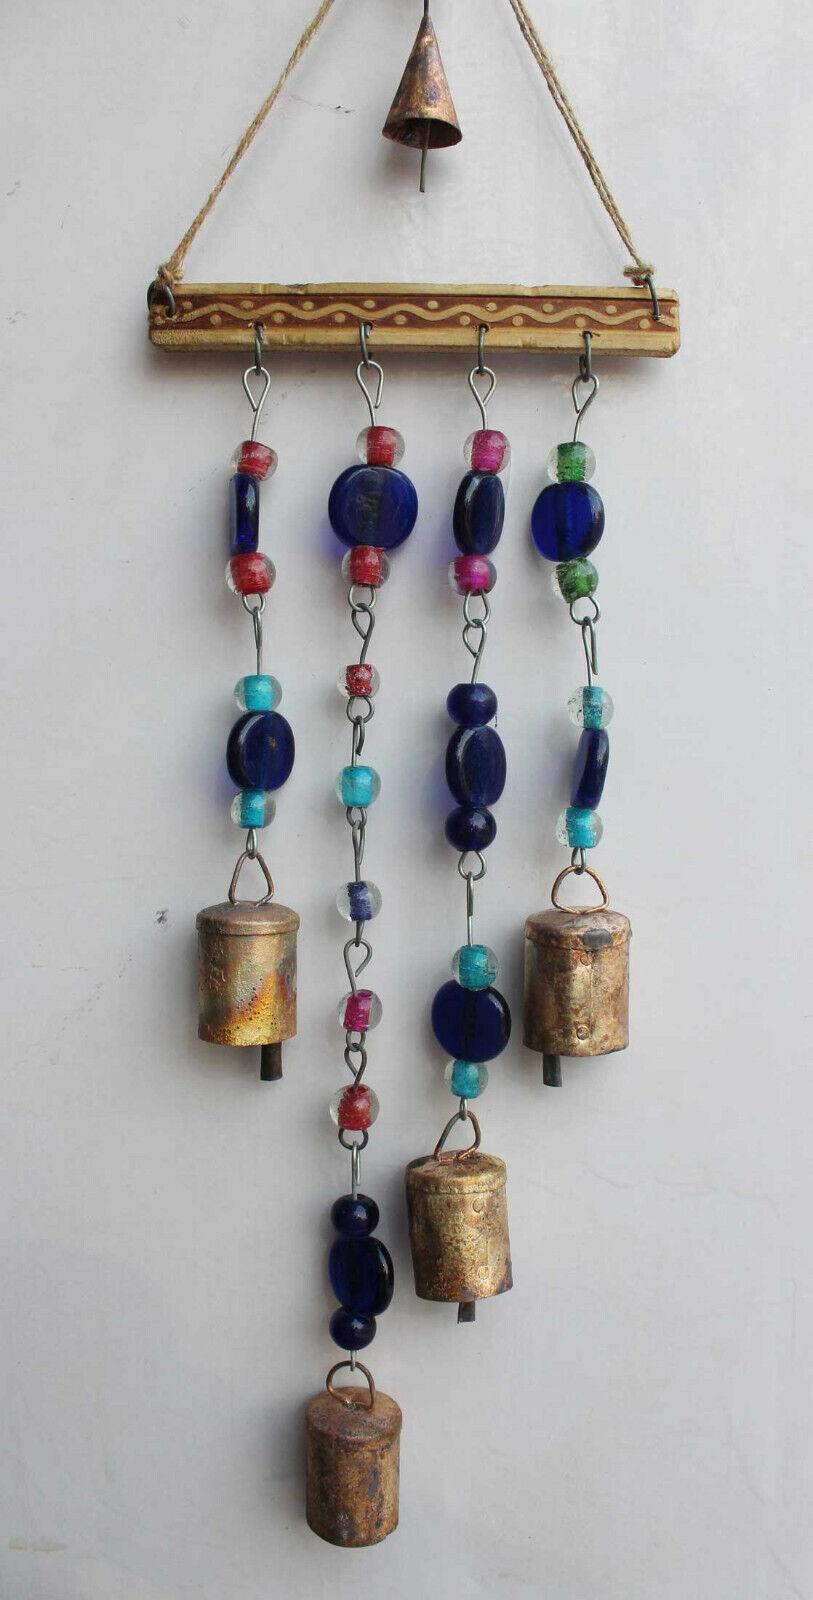 Recycled Iron Bells Boho Decor Windchime with Beads & Bells Suncatcher Outdoor